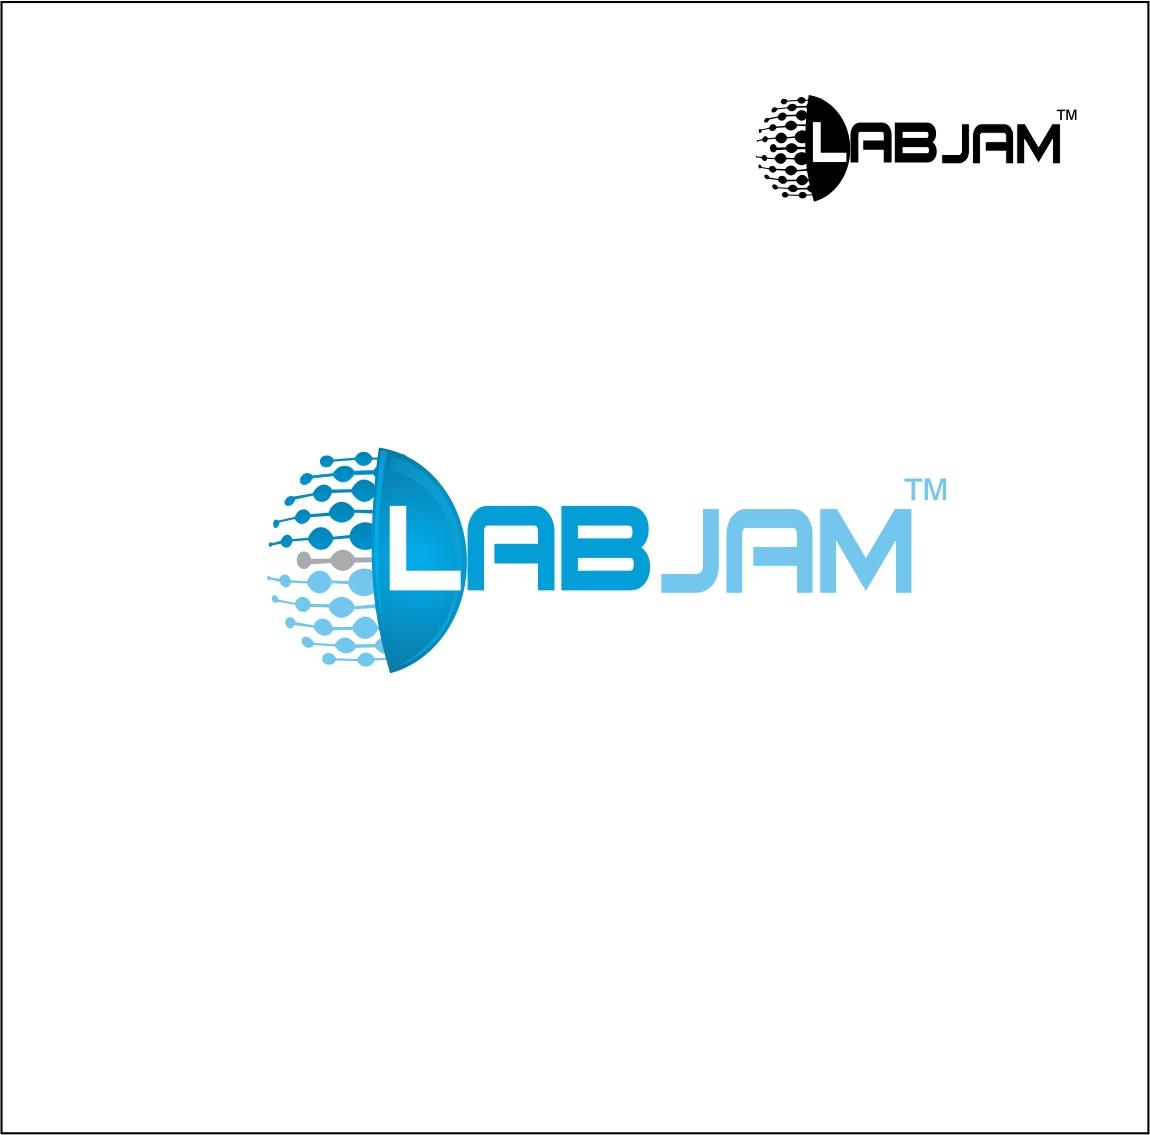 Logo Design by arkvisdesigns - Entry No. 155 in the Logo Design Contest Labjam.